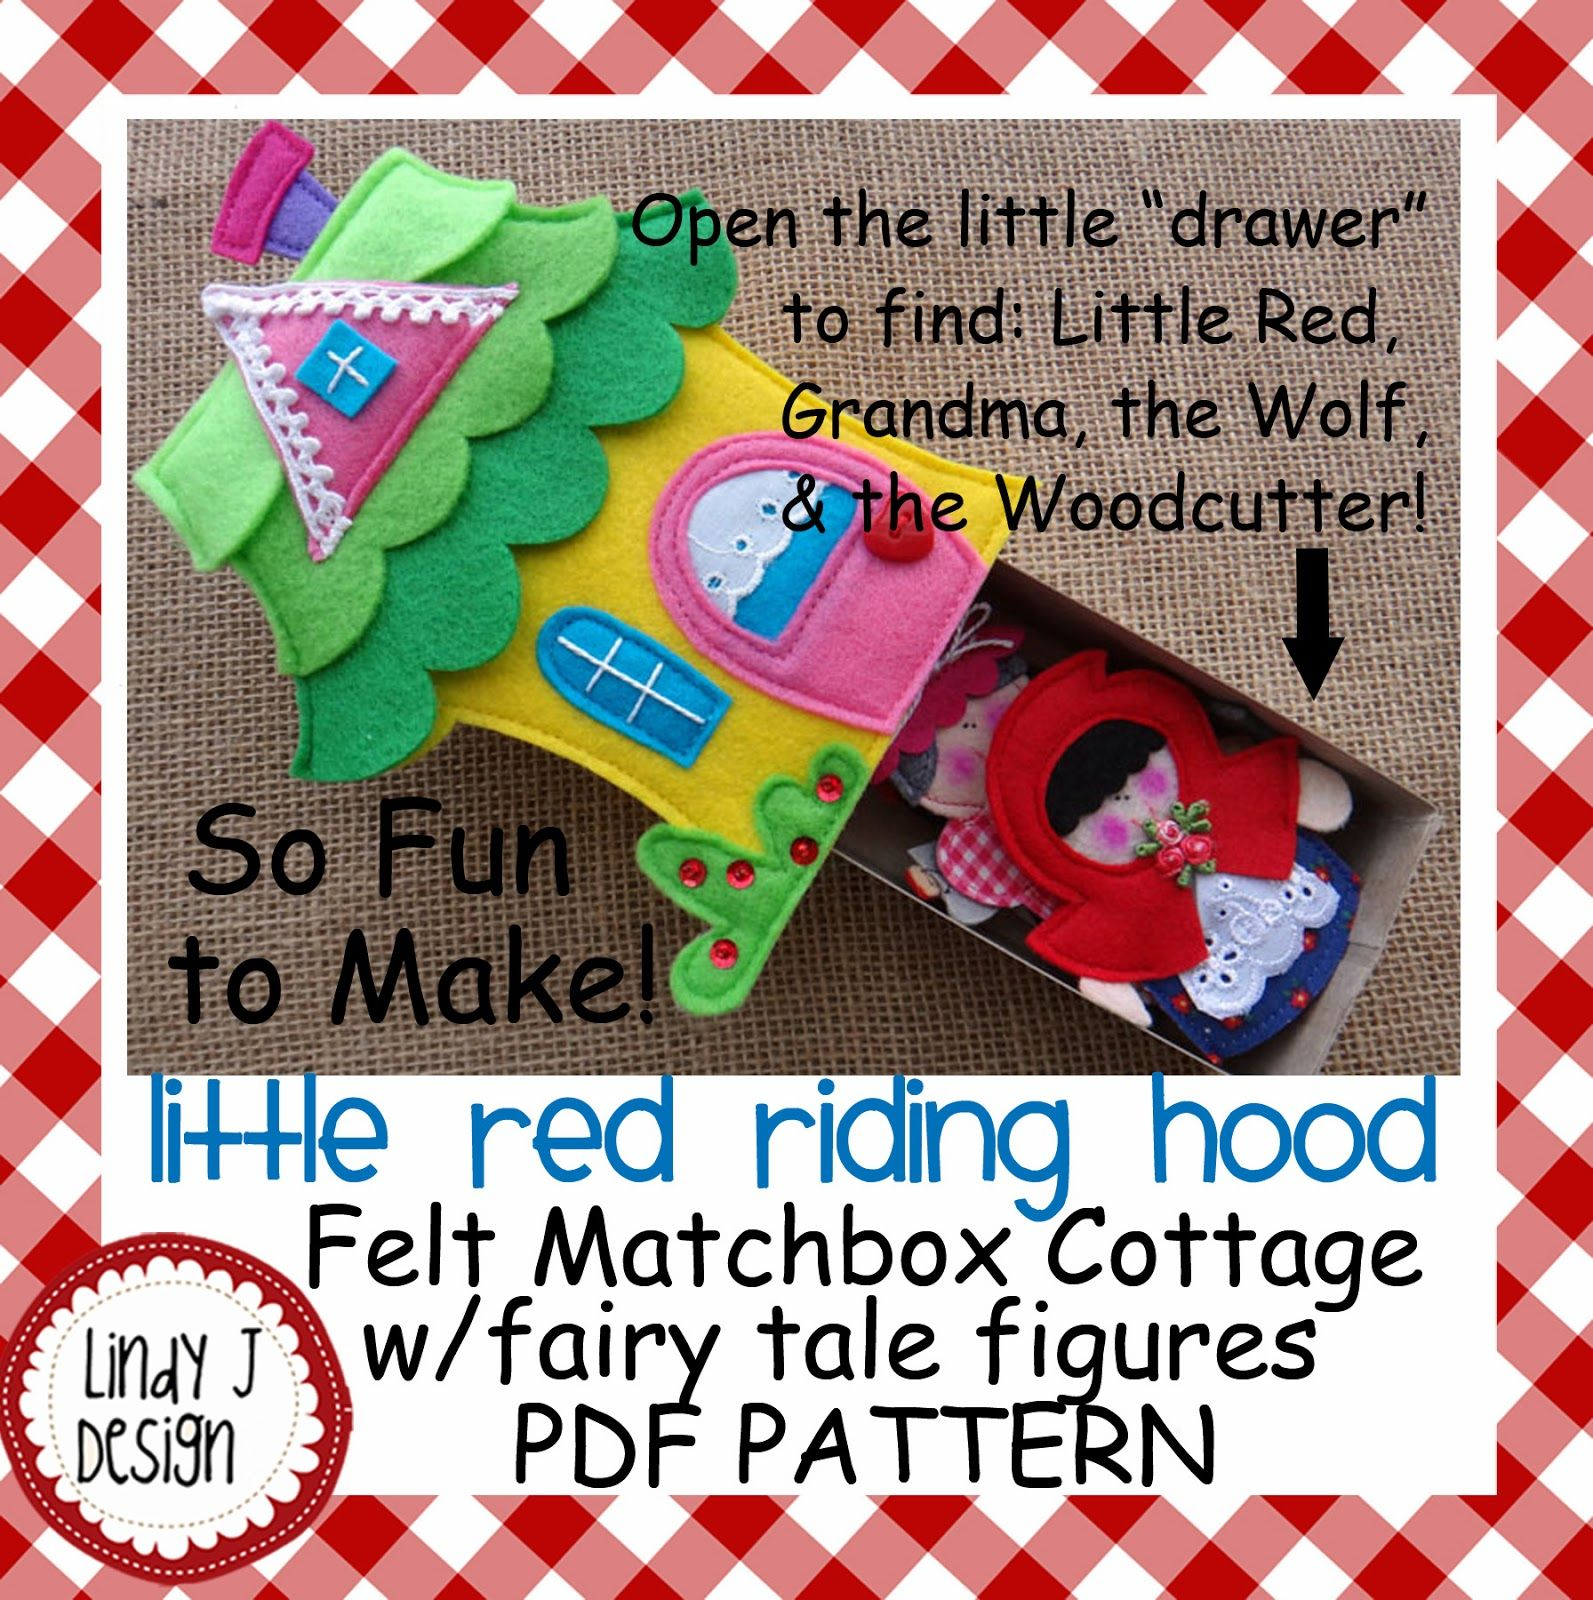 Find the PDF Pattern here: | FLOR CETIMCoisas para usar | Pinterest